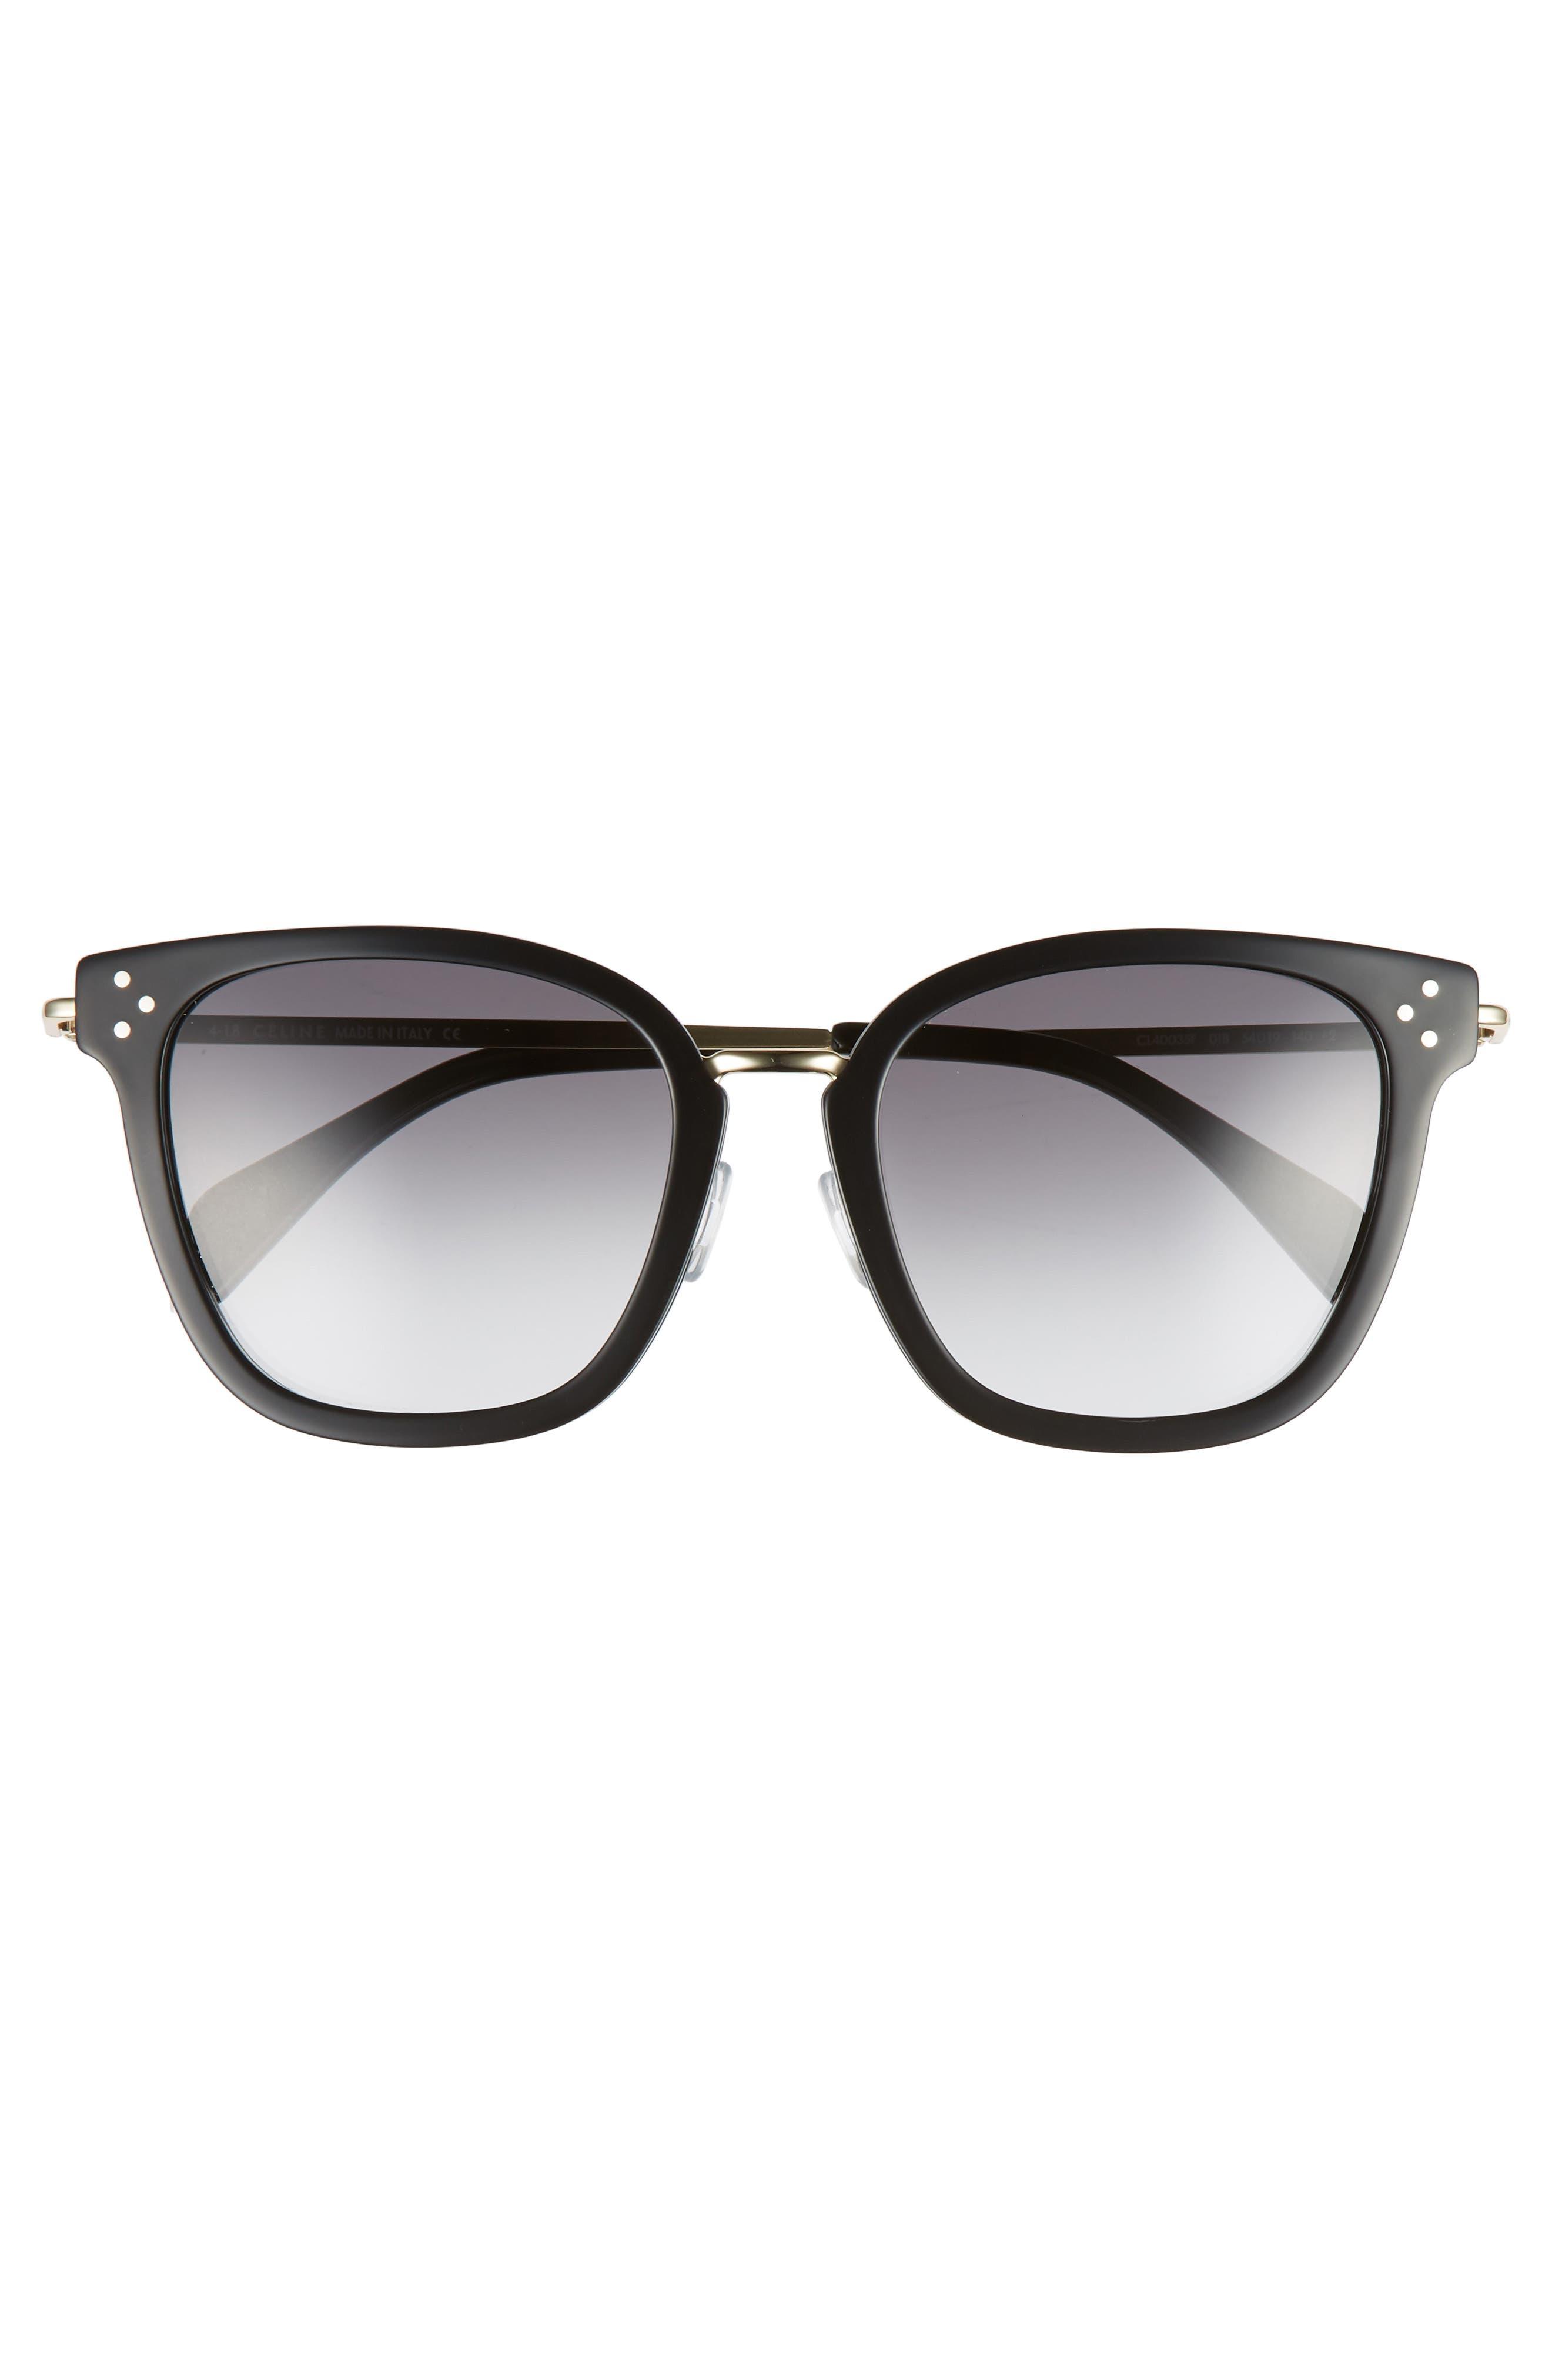 CELINE,                             Special Fit 54mm Sunglasses,                             Alternate thumbnail 3, color,                             BLACK/ GOLD/ SMOKE